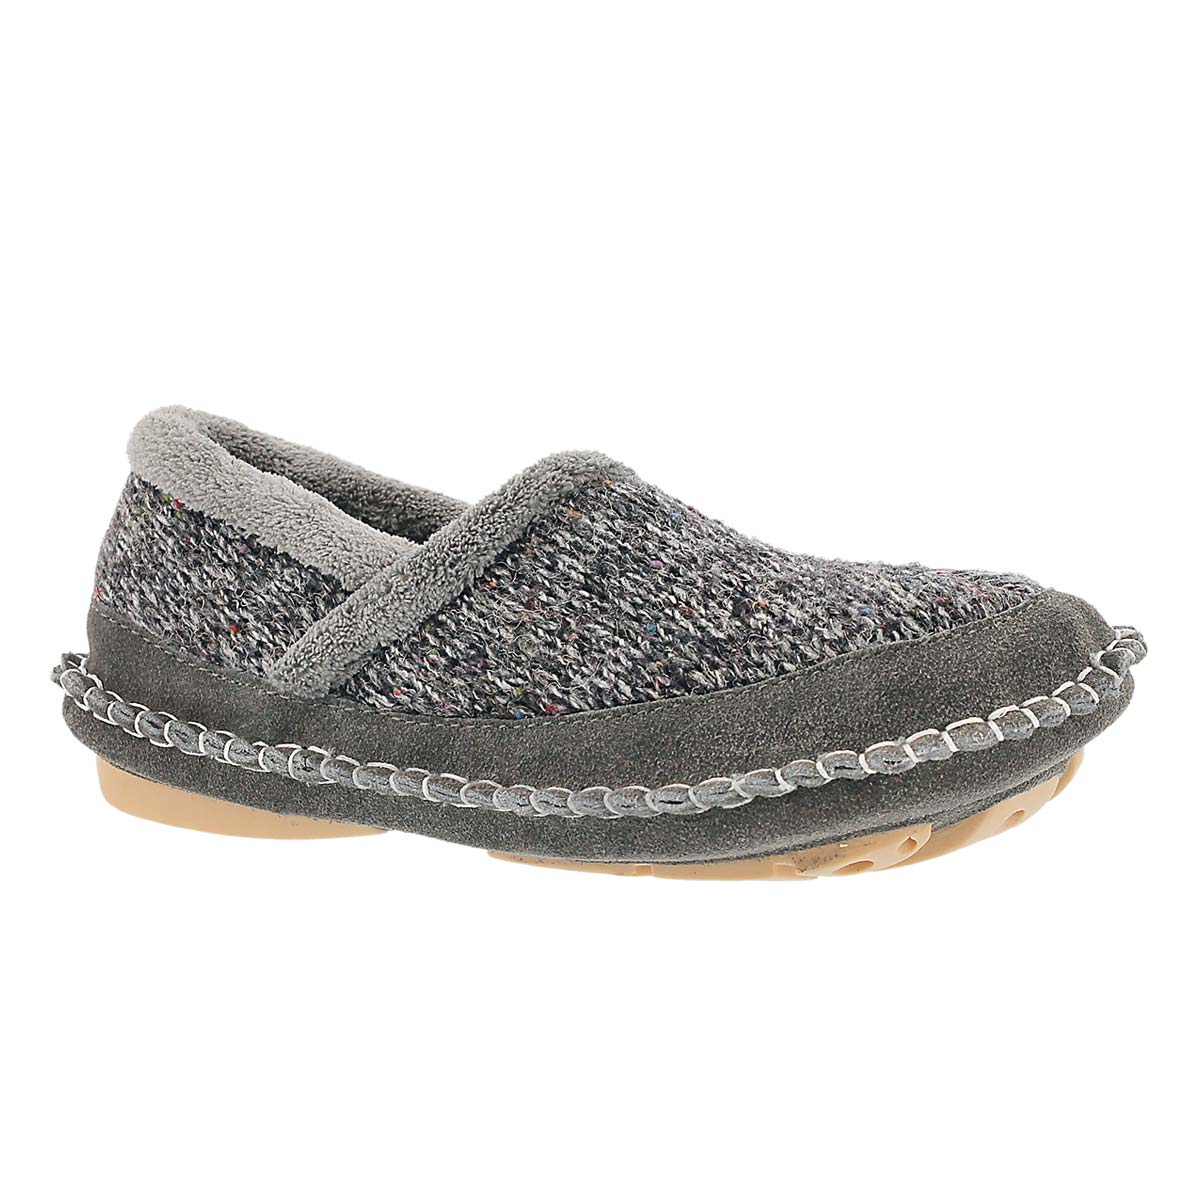 Lds Amelia grey closed back slipper